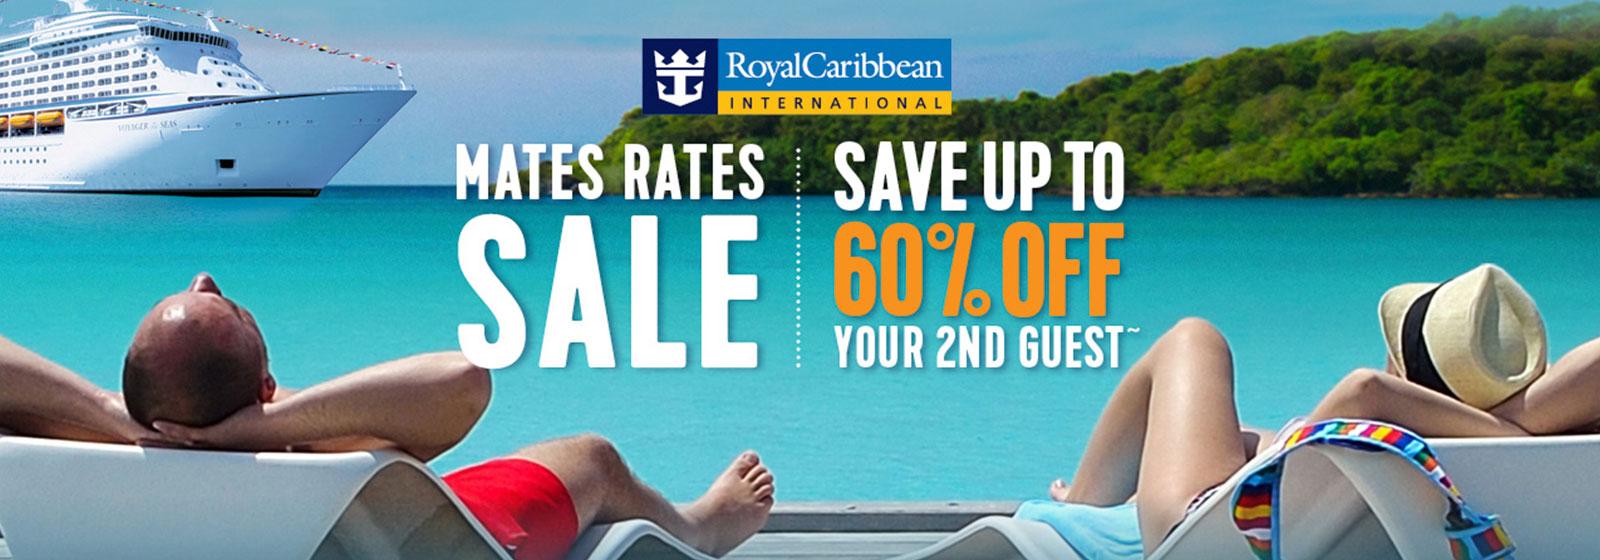 Royal Caribbean Mates Rates Sale